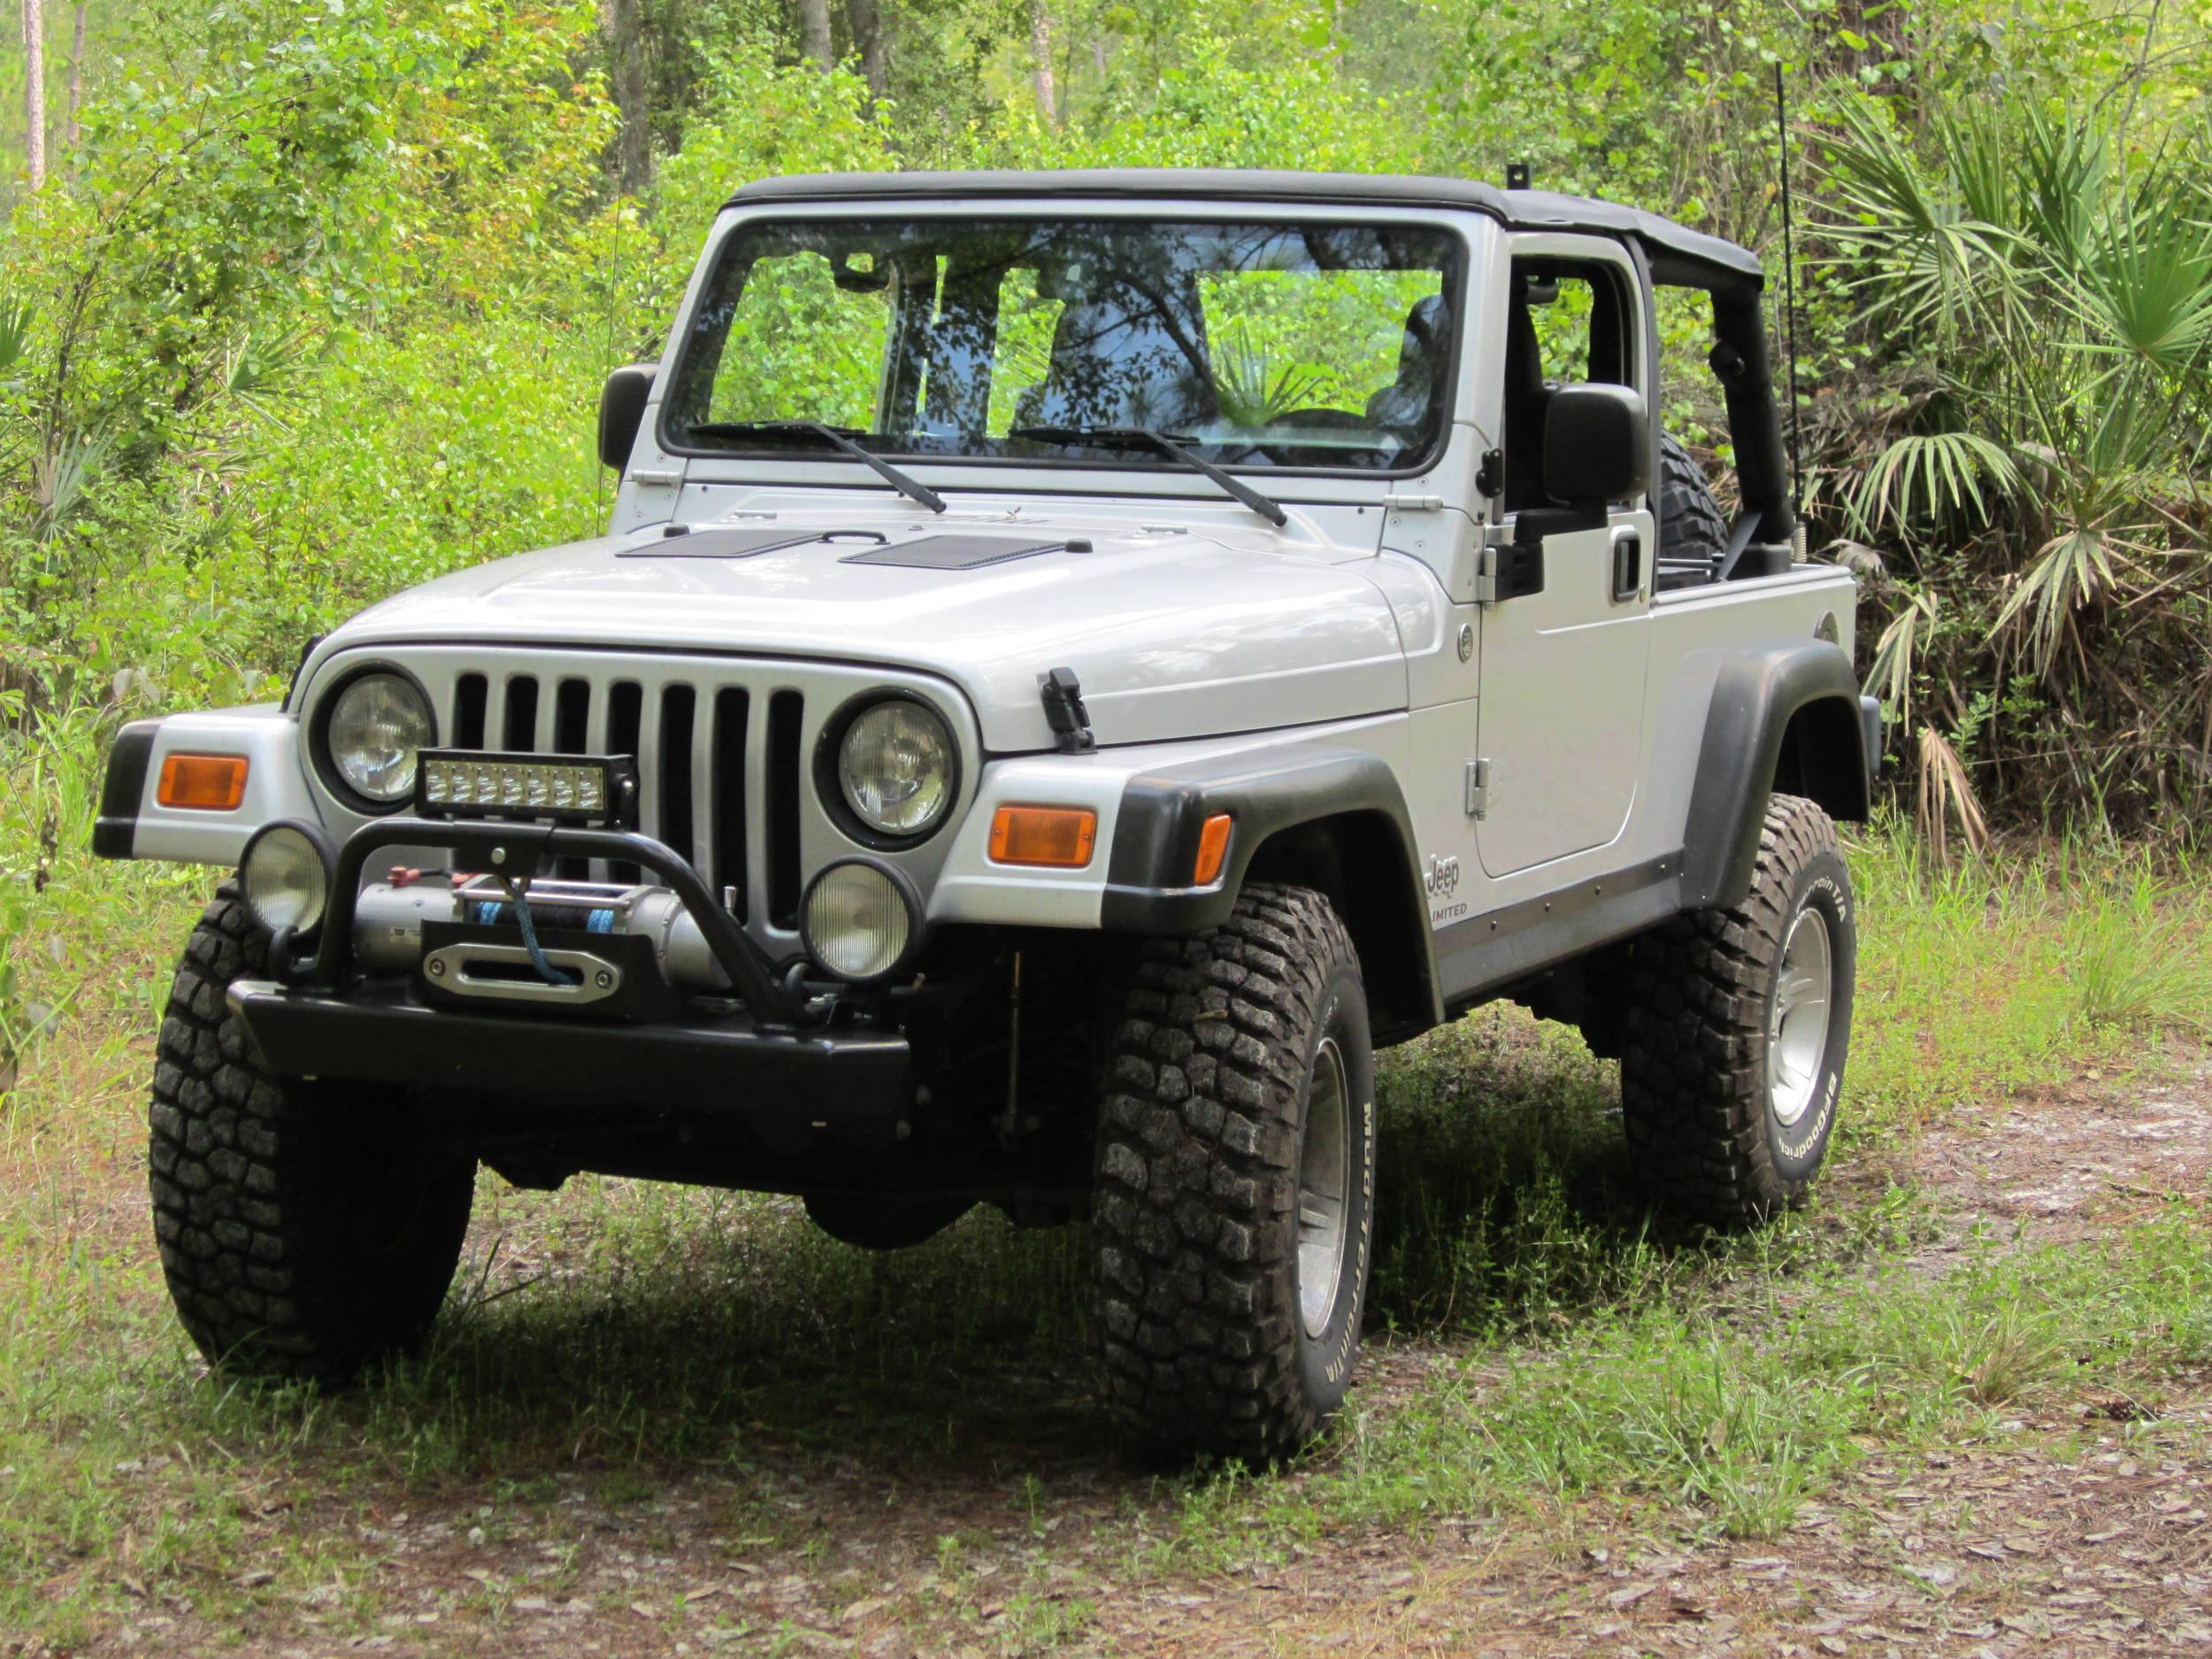 Tj Lj Ome Lift On 33x10 5x15 Tires Jeepforum Com